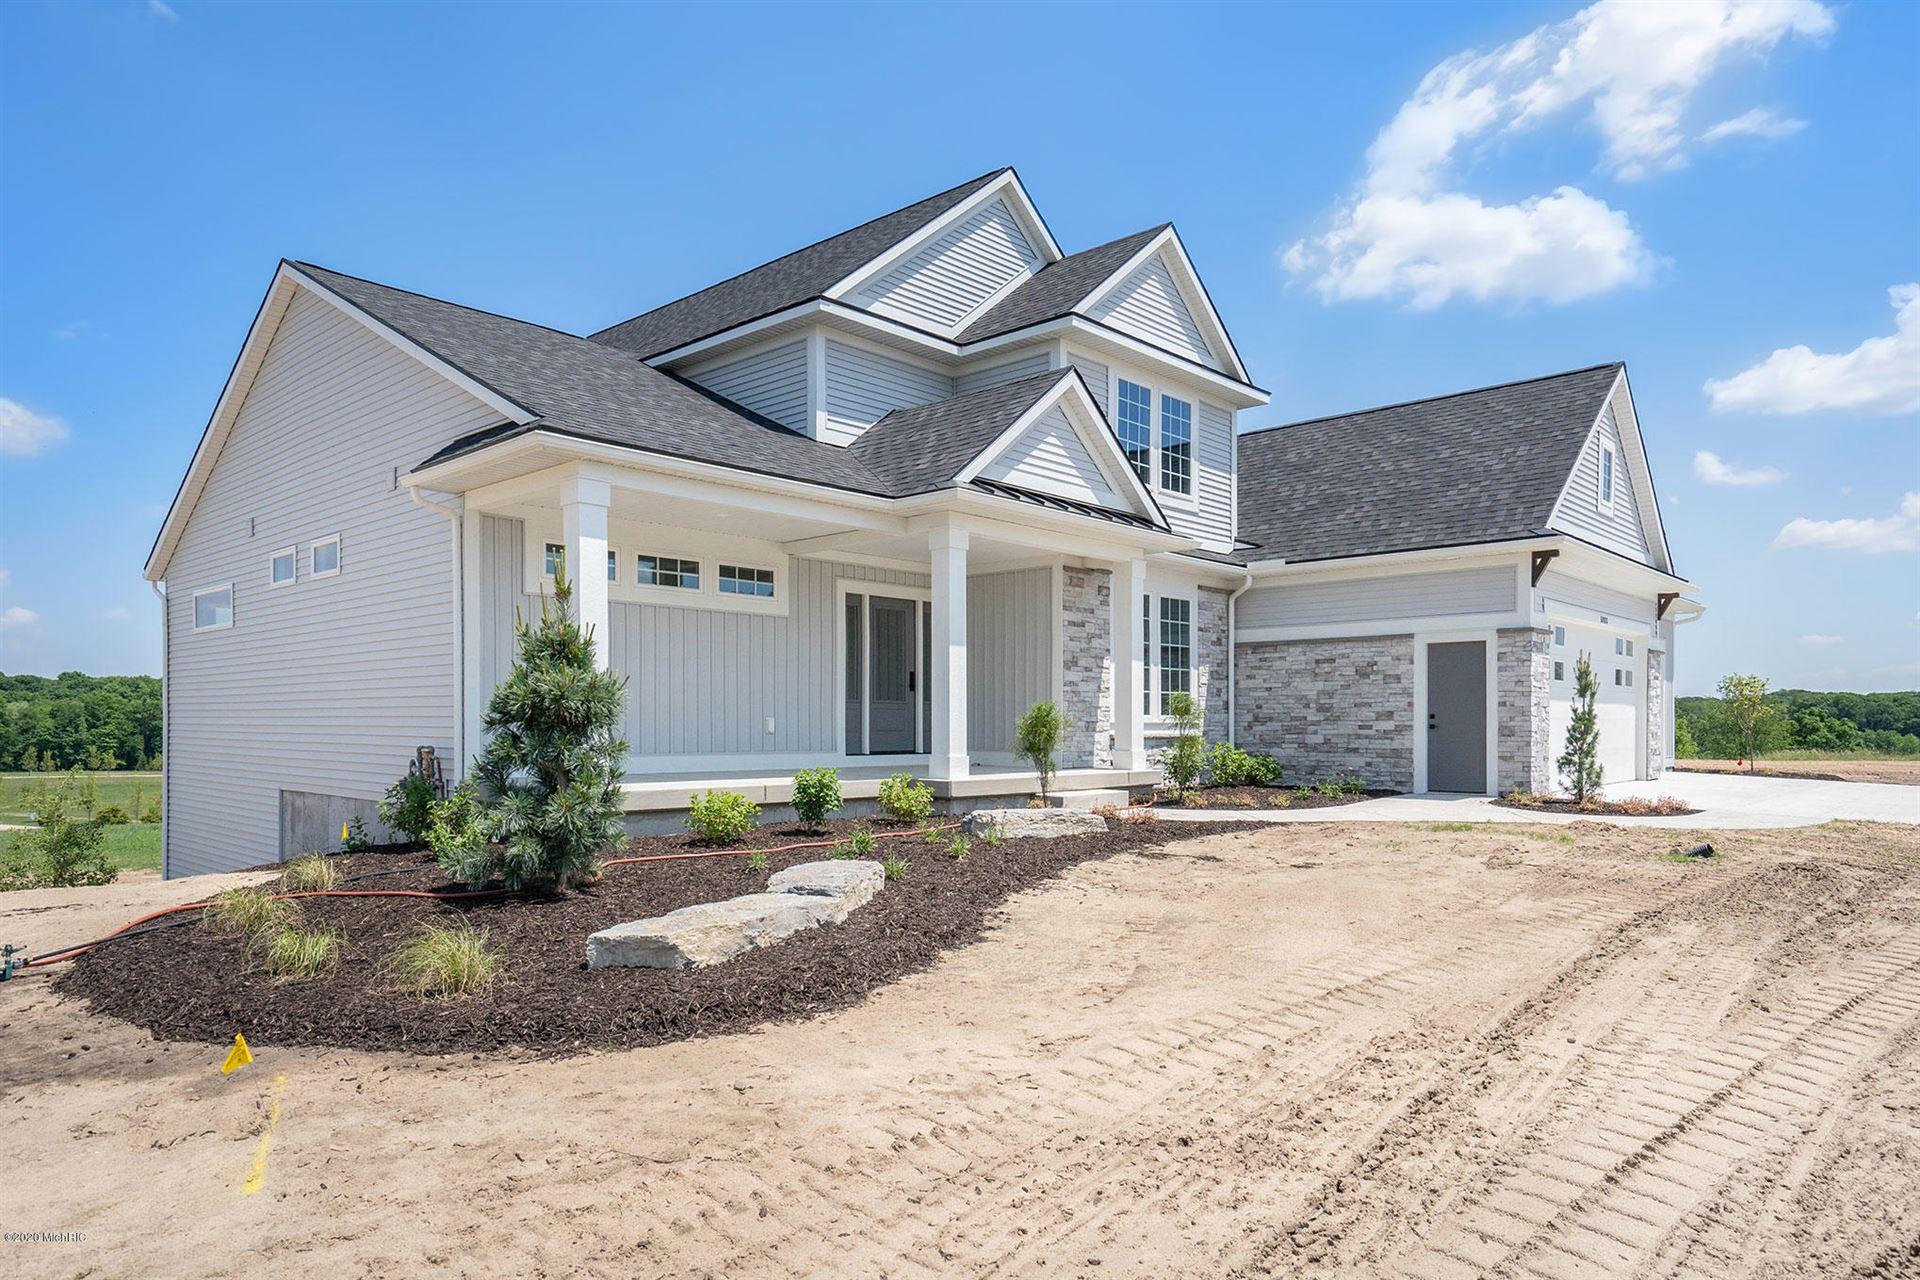 Photo of 5983 Halliday Ridge Drive SE, Grand Rapids, MI 49546 (MLS # 20023815)